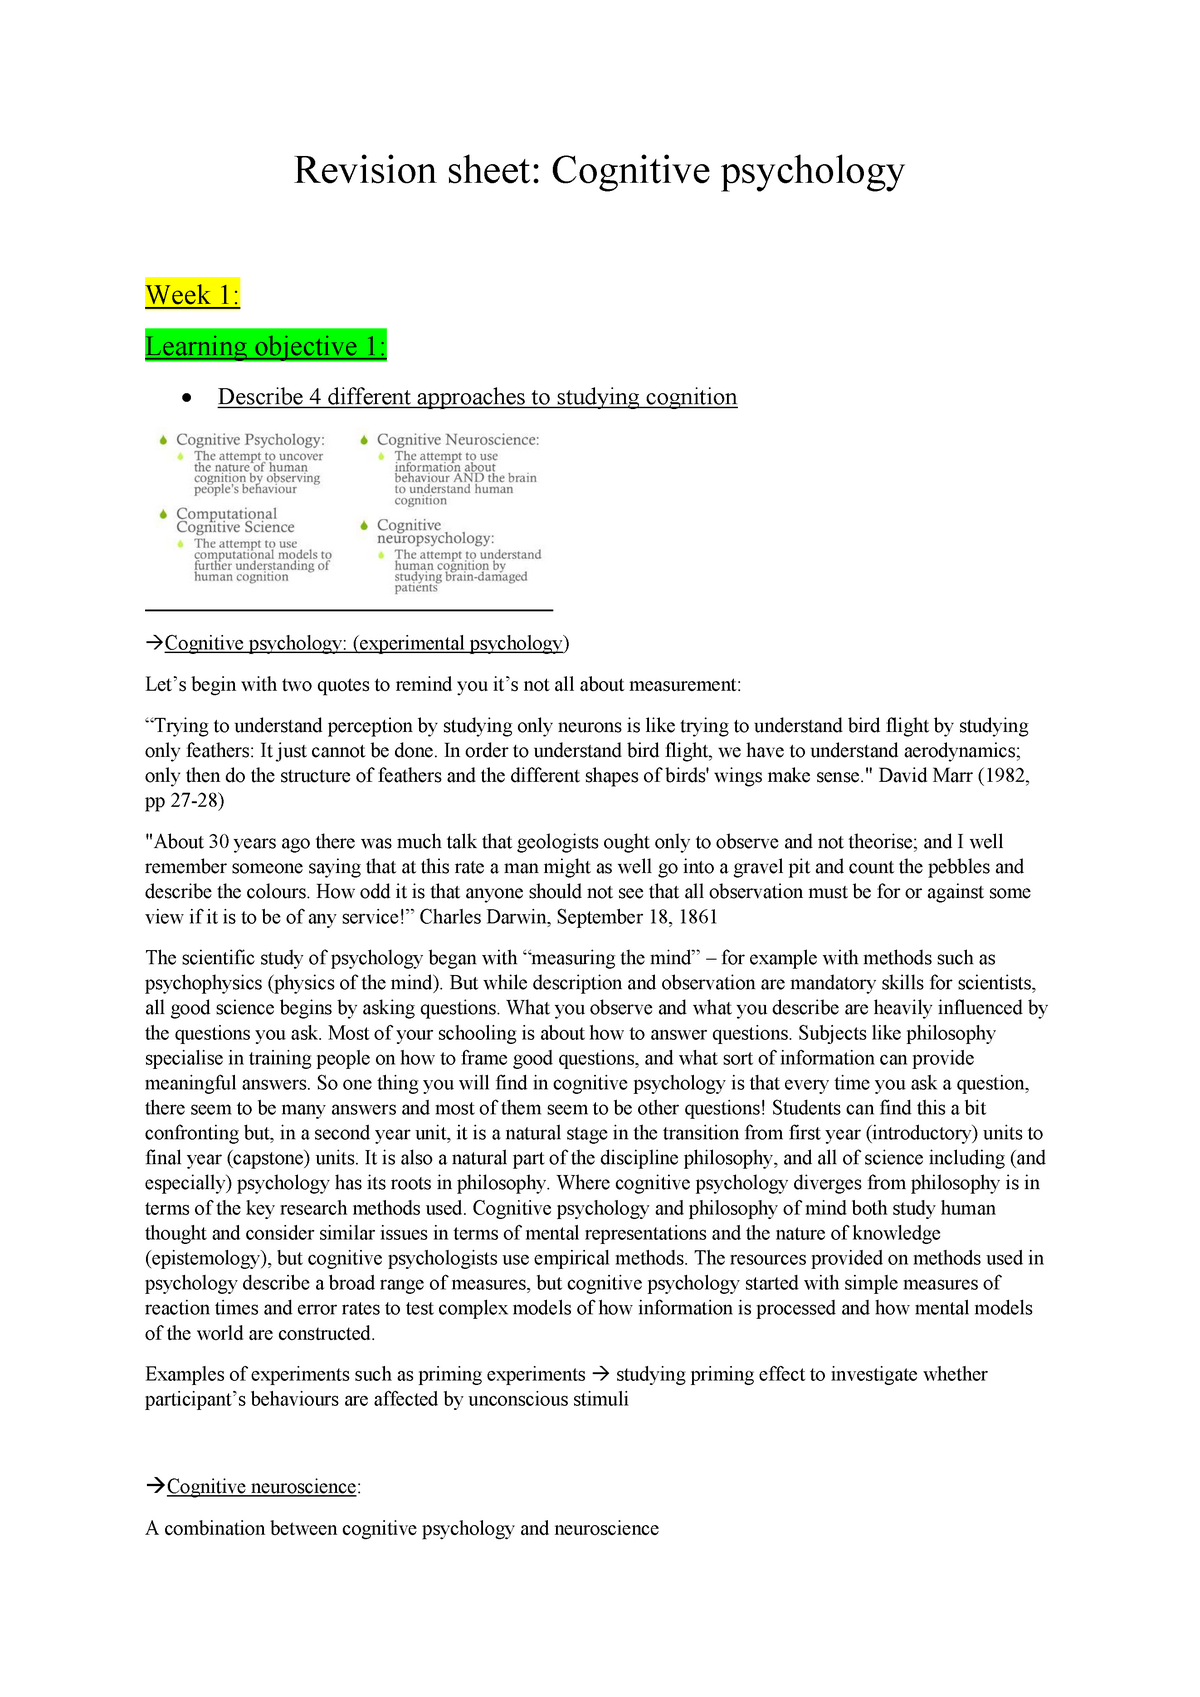 Revision sheet cognitive psychology - PSY20006 - Swinburne